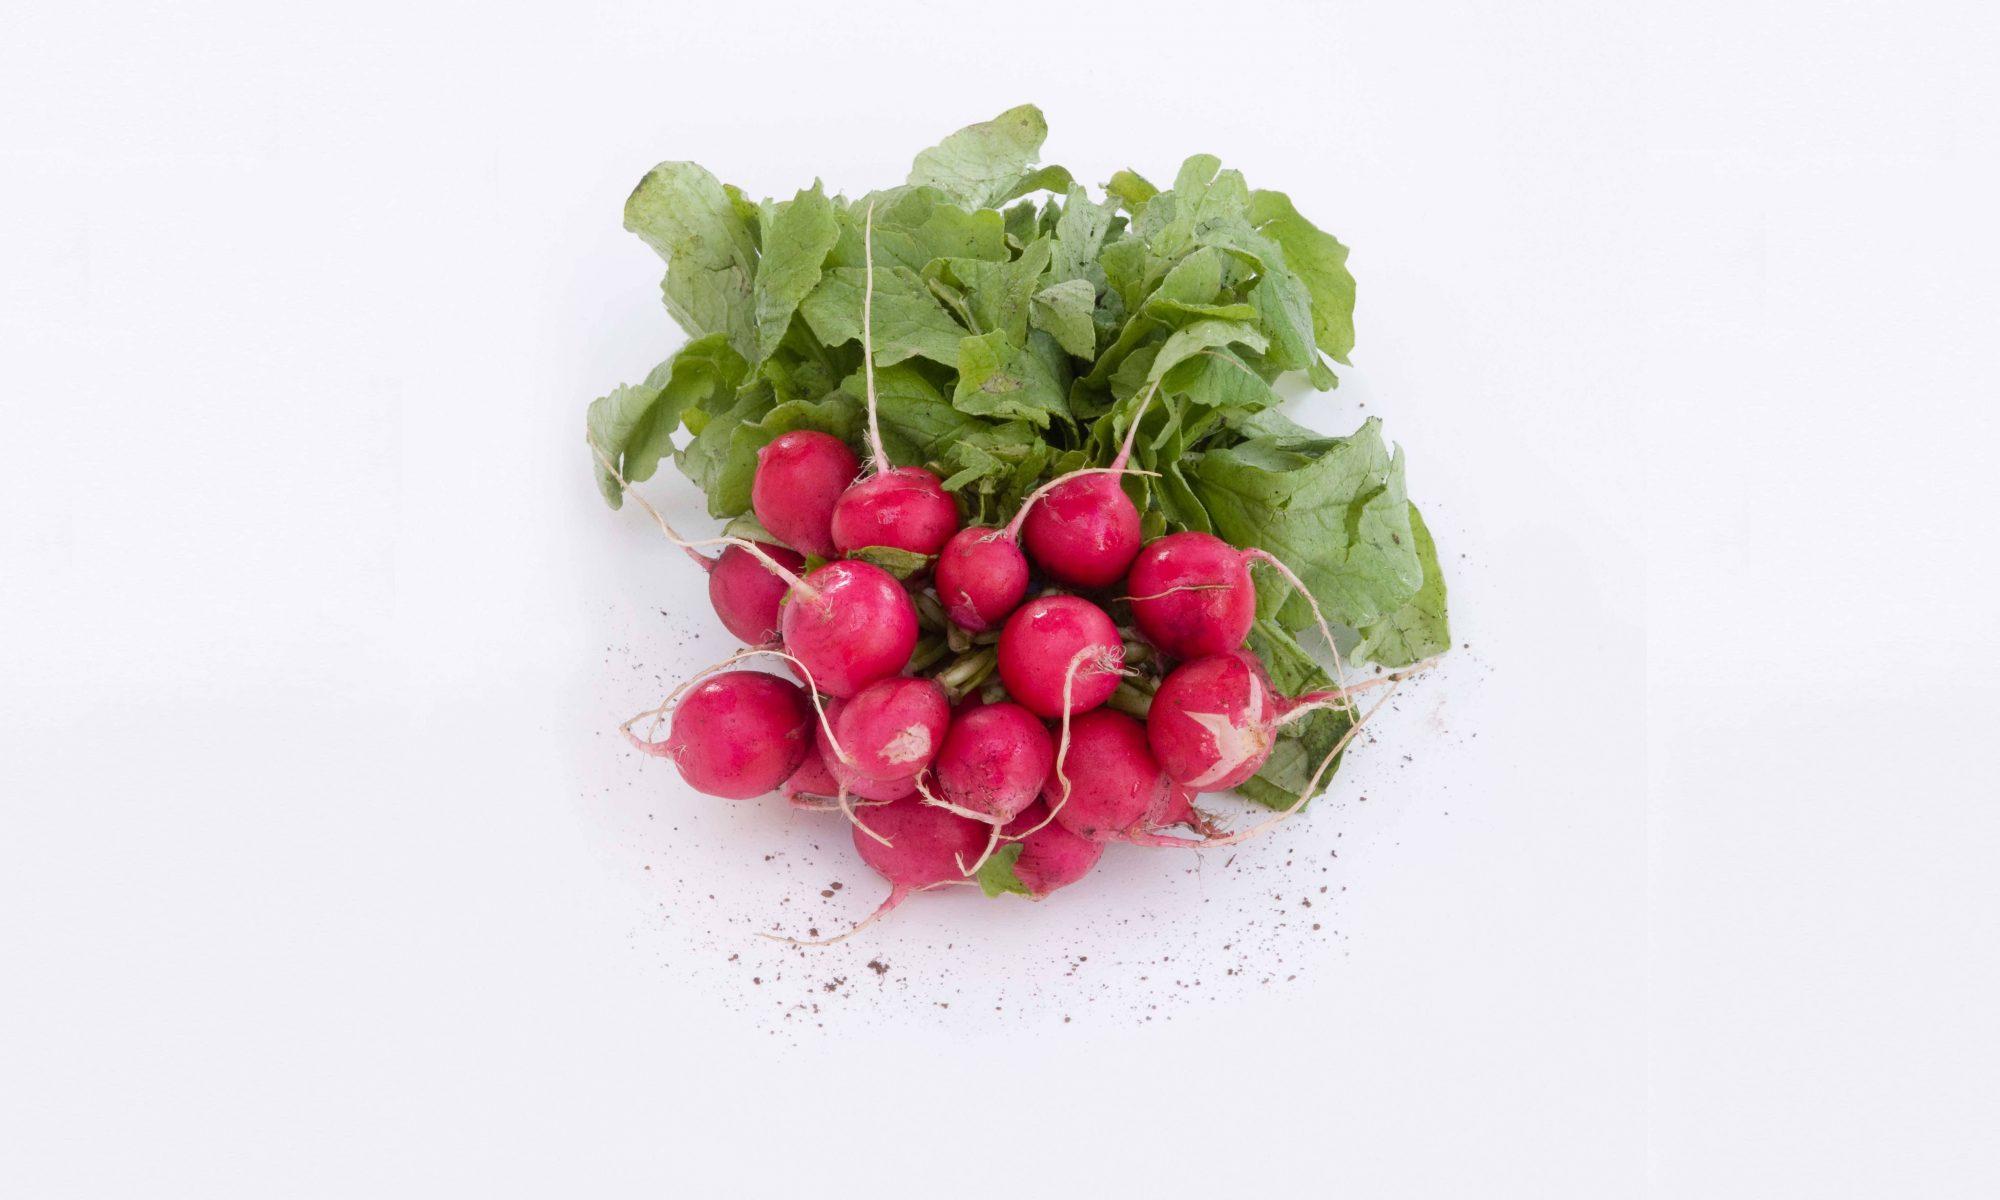 bunch of radishes on white background